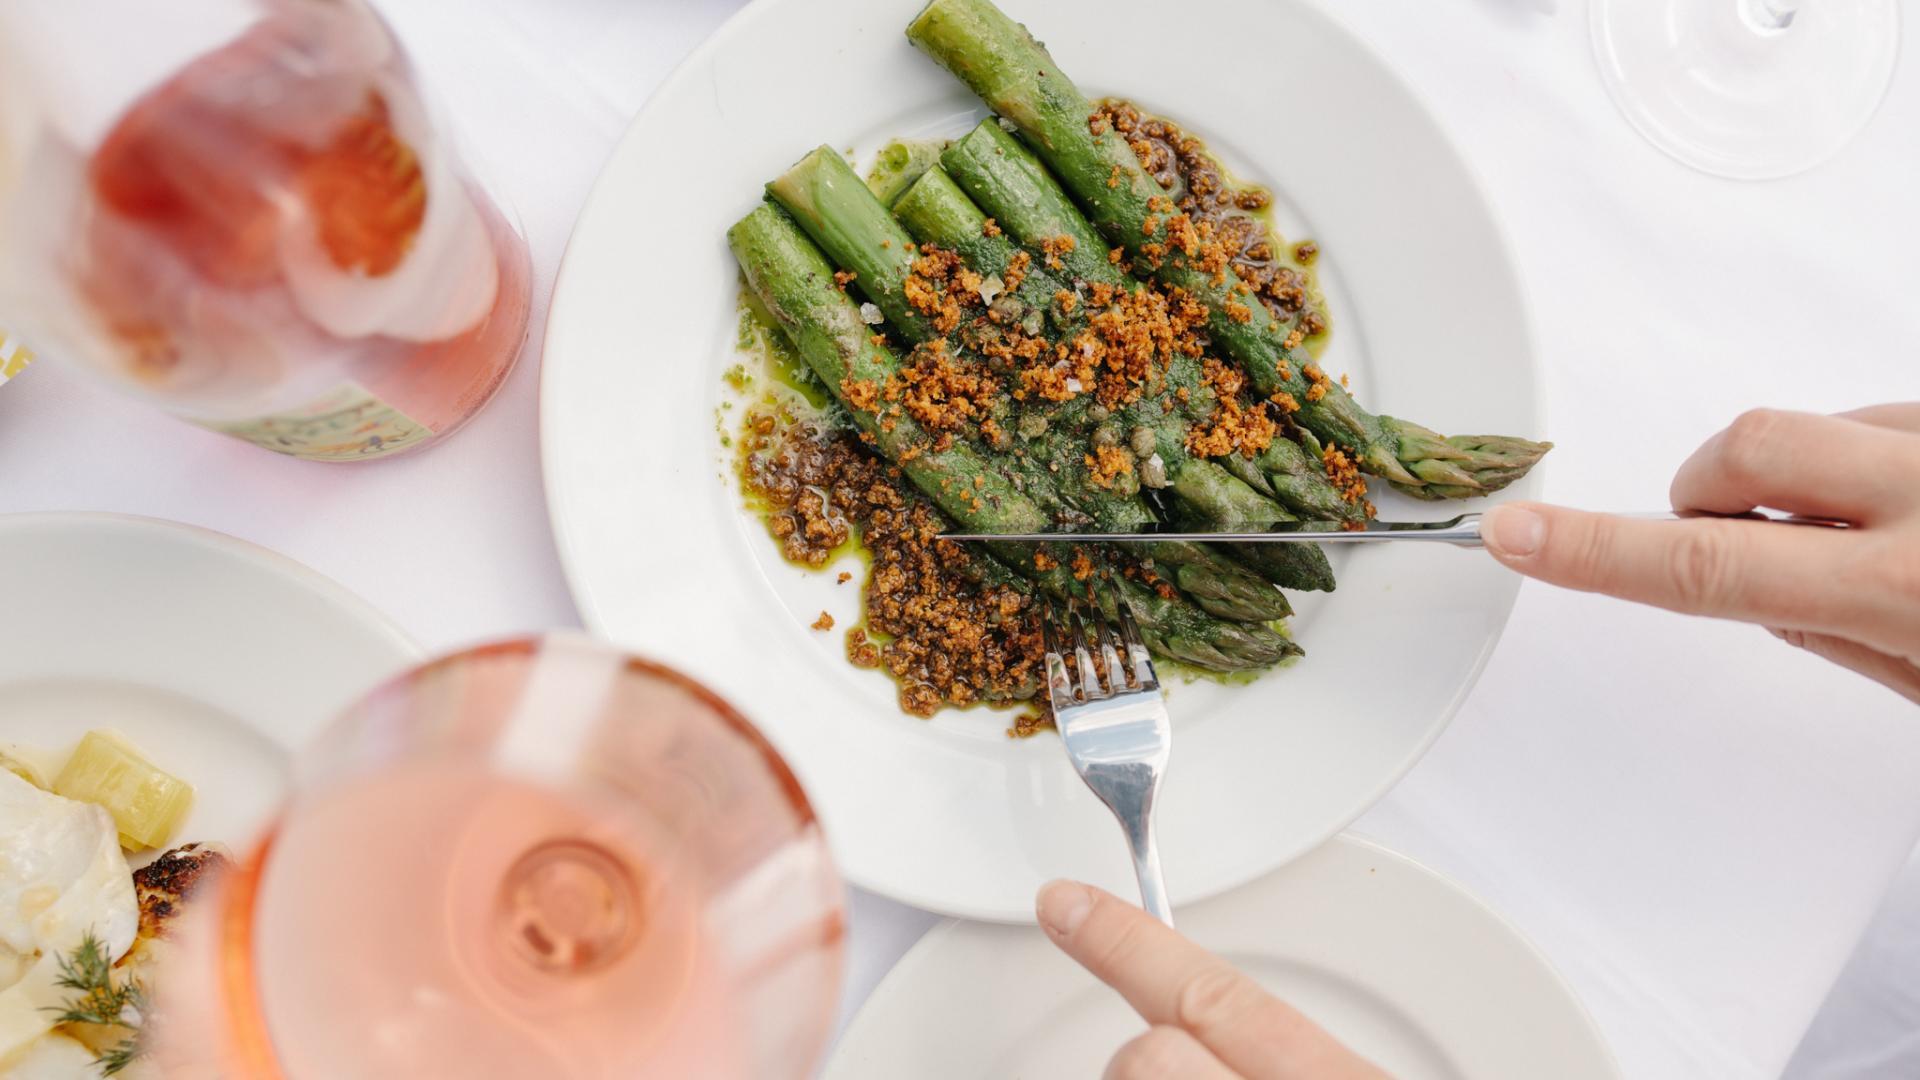 Mediterranean-inspired cooking at Barletta